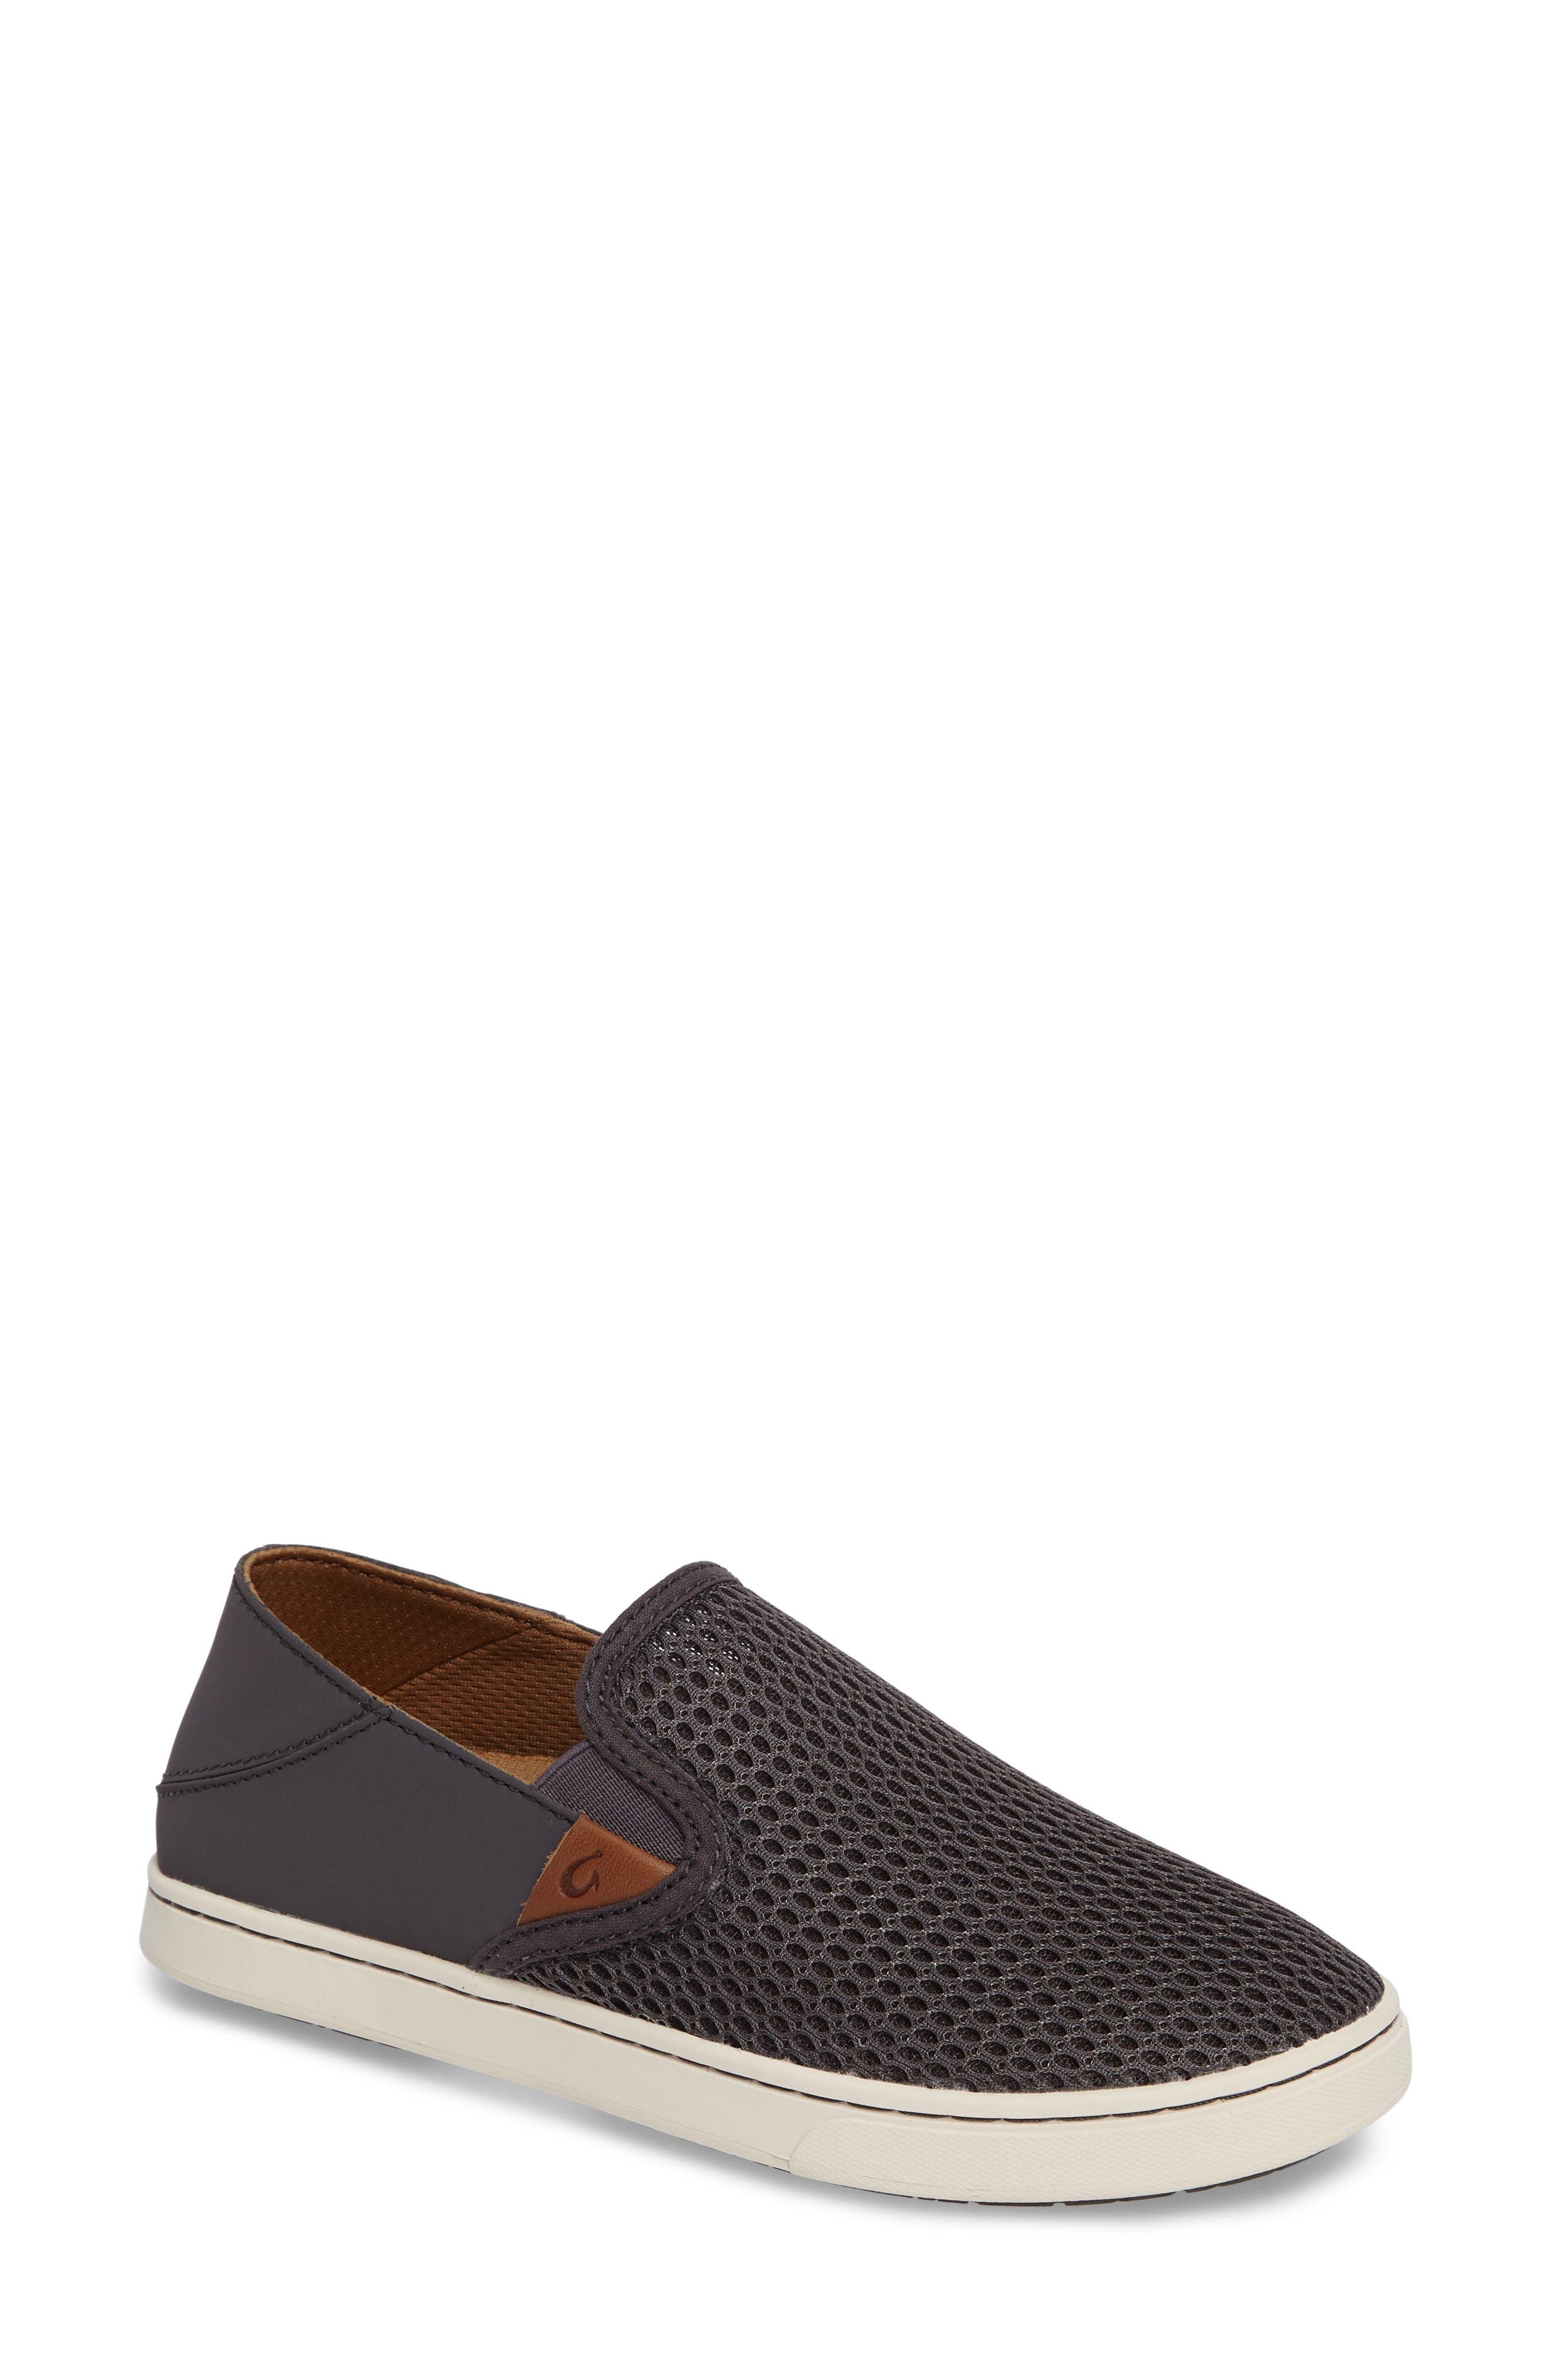 'Pehuea' Slip-On Sneaker,                             Main thumbnail 1, color,                             PAVEMENT/ PAVEMENT FABRIC